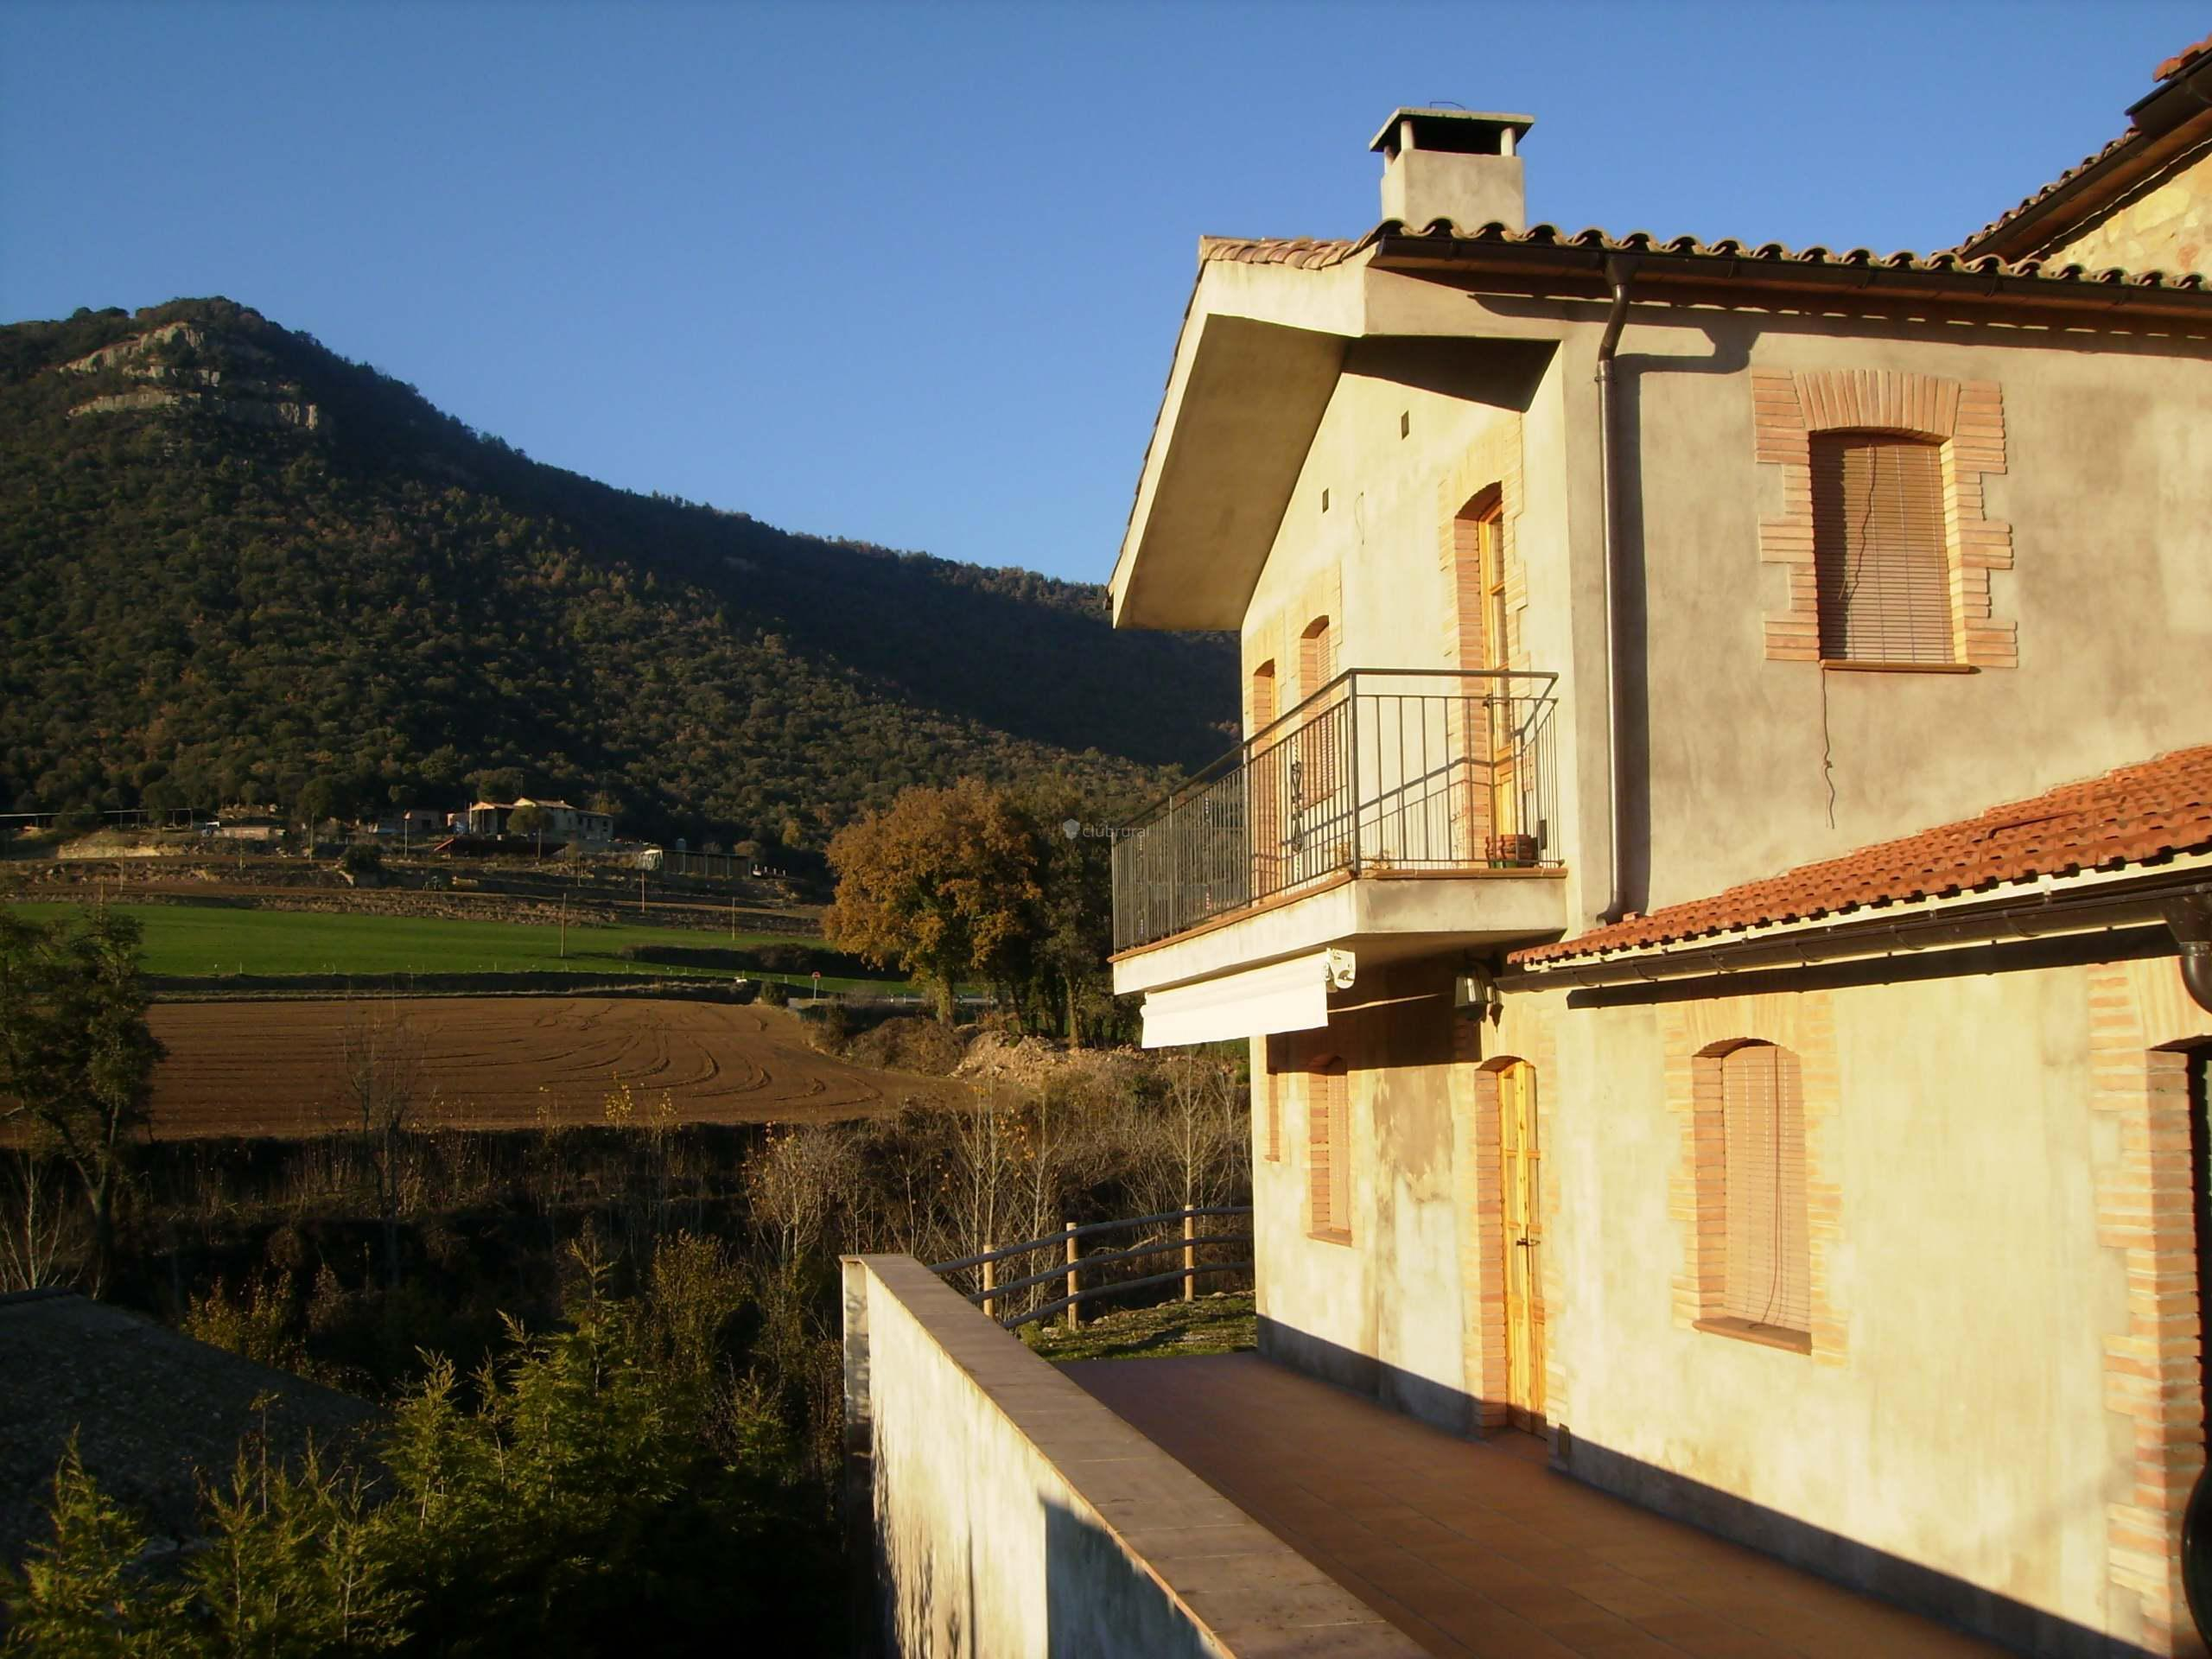 Fotos de casa lluert de clar barcelona avia clubrural - Alquiler casas rurales barcelona ...